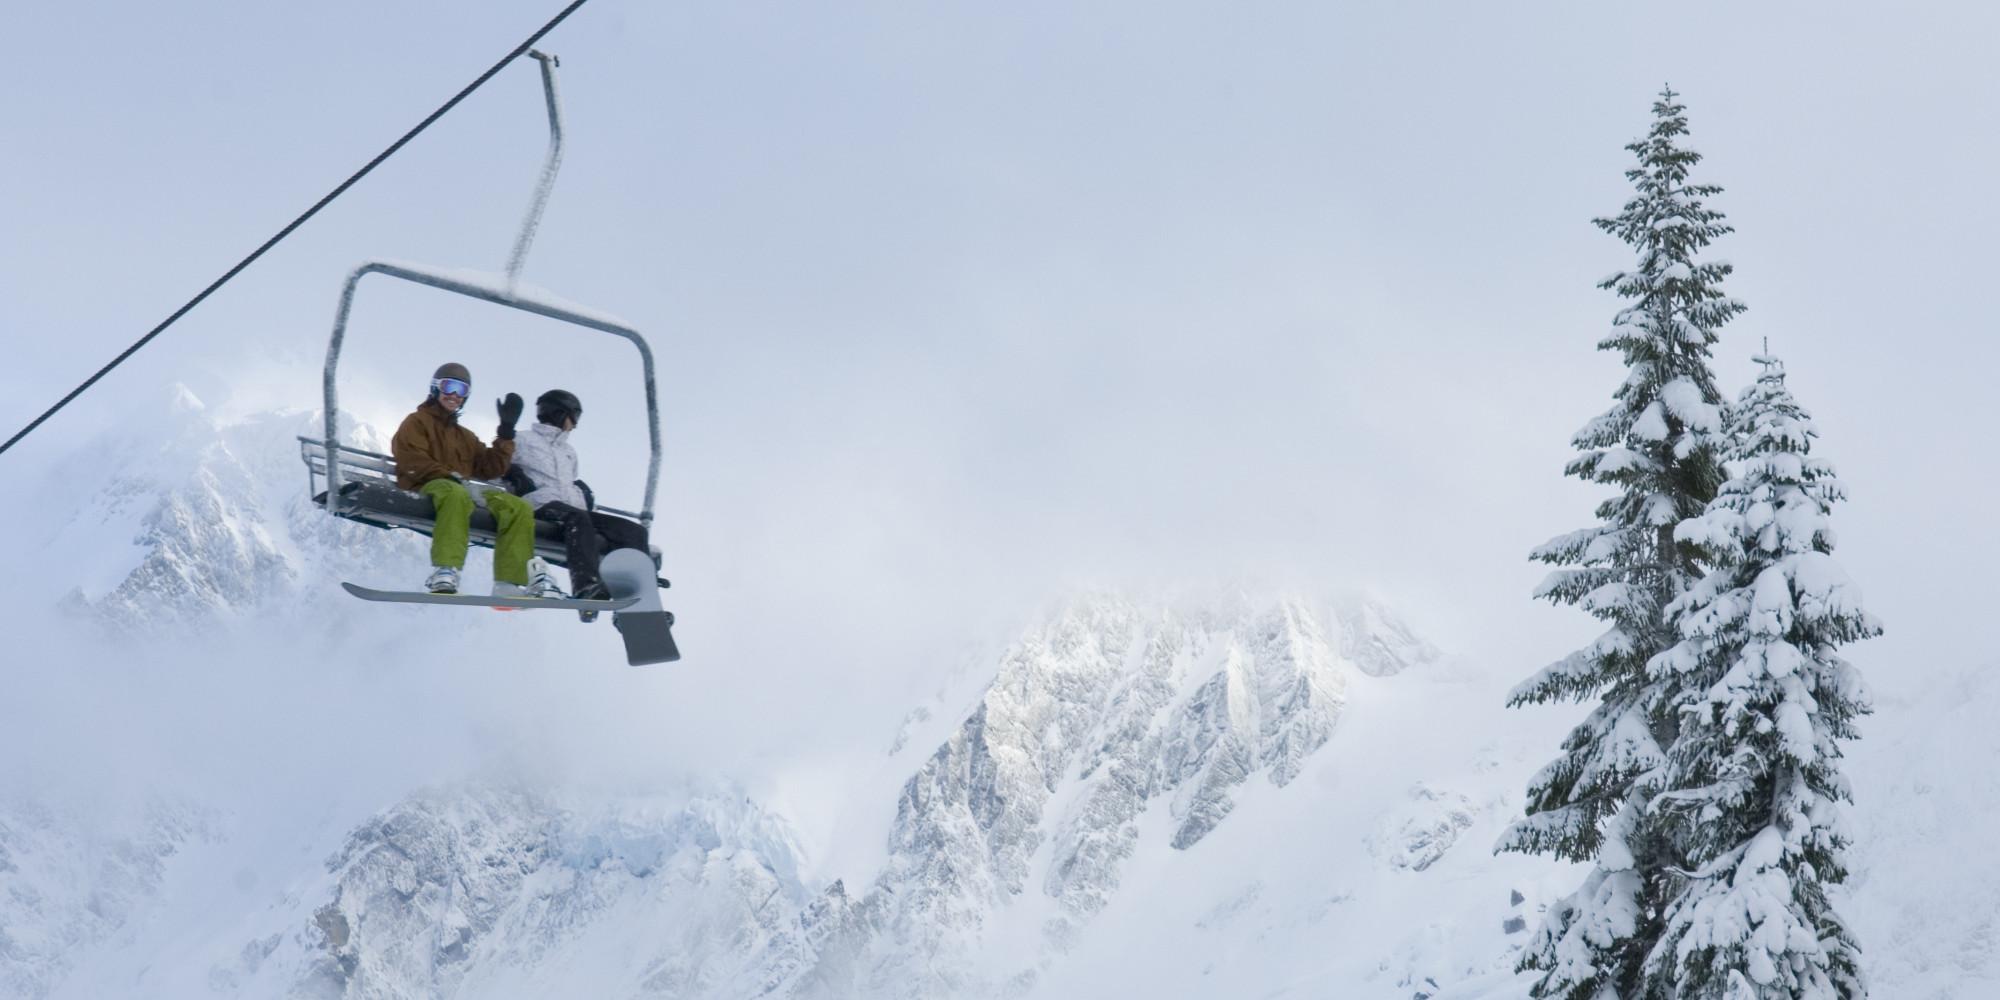 ski lift skiing snowboarding - photo #4